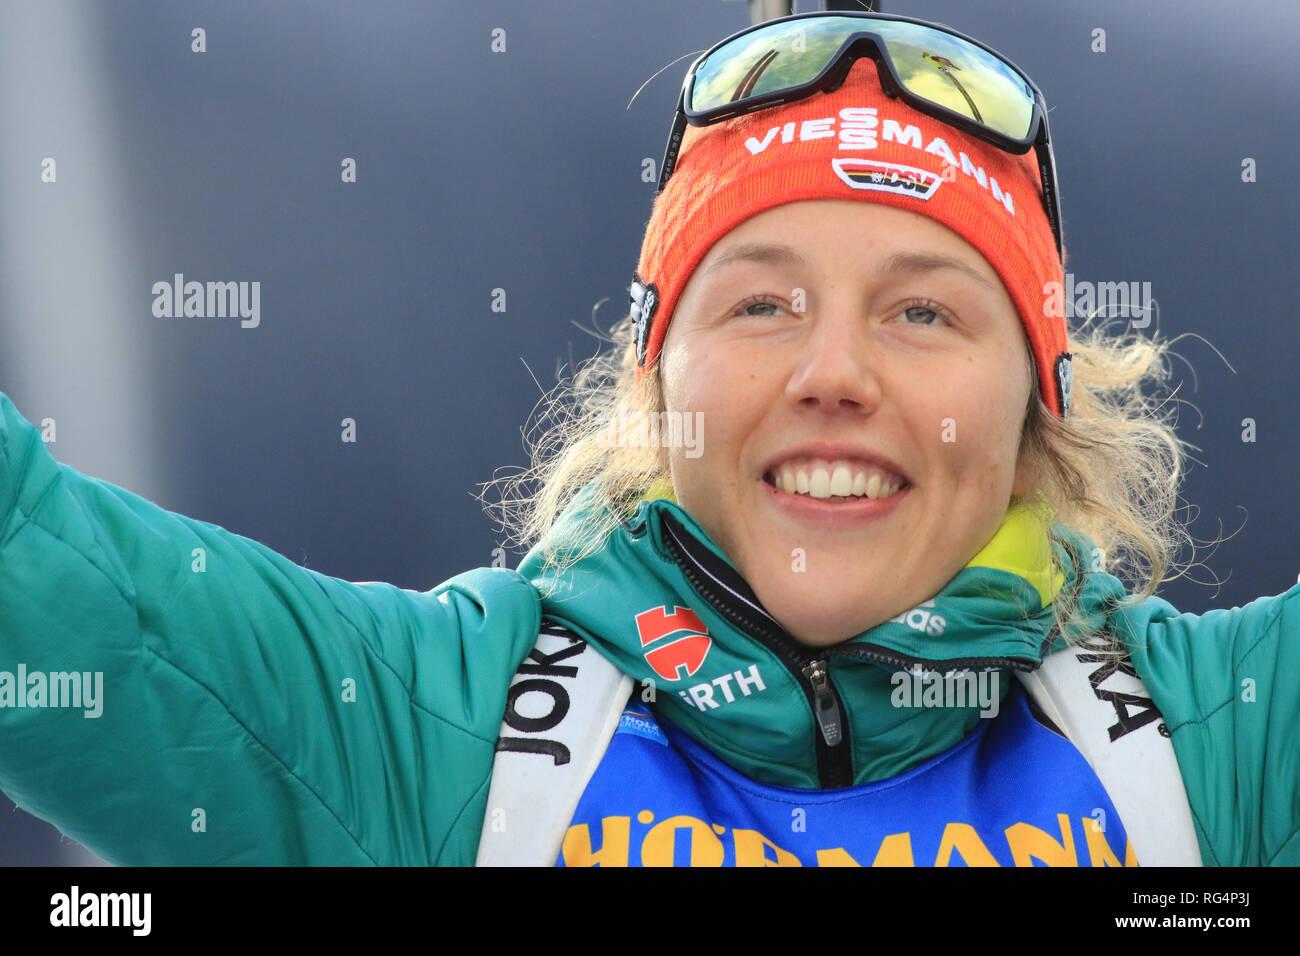 Antholz Antholz, Italien. 27 Jan, 2019. BMW Biathlon Weltcup, massenstart Frauen; Laura Dahlmeier (GER) feiert Credit: Aktion plus Sport/Alamy leben Nachrichten Stockbild